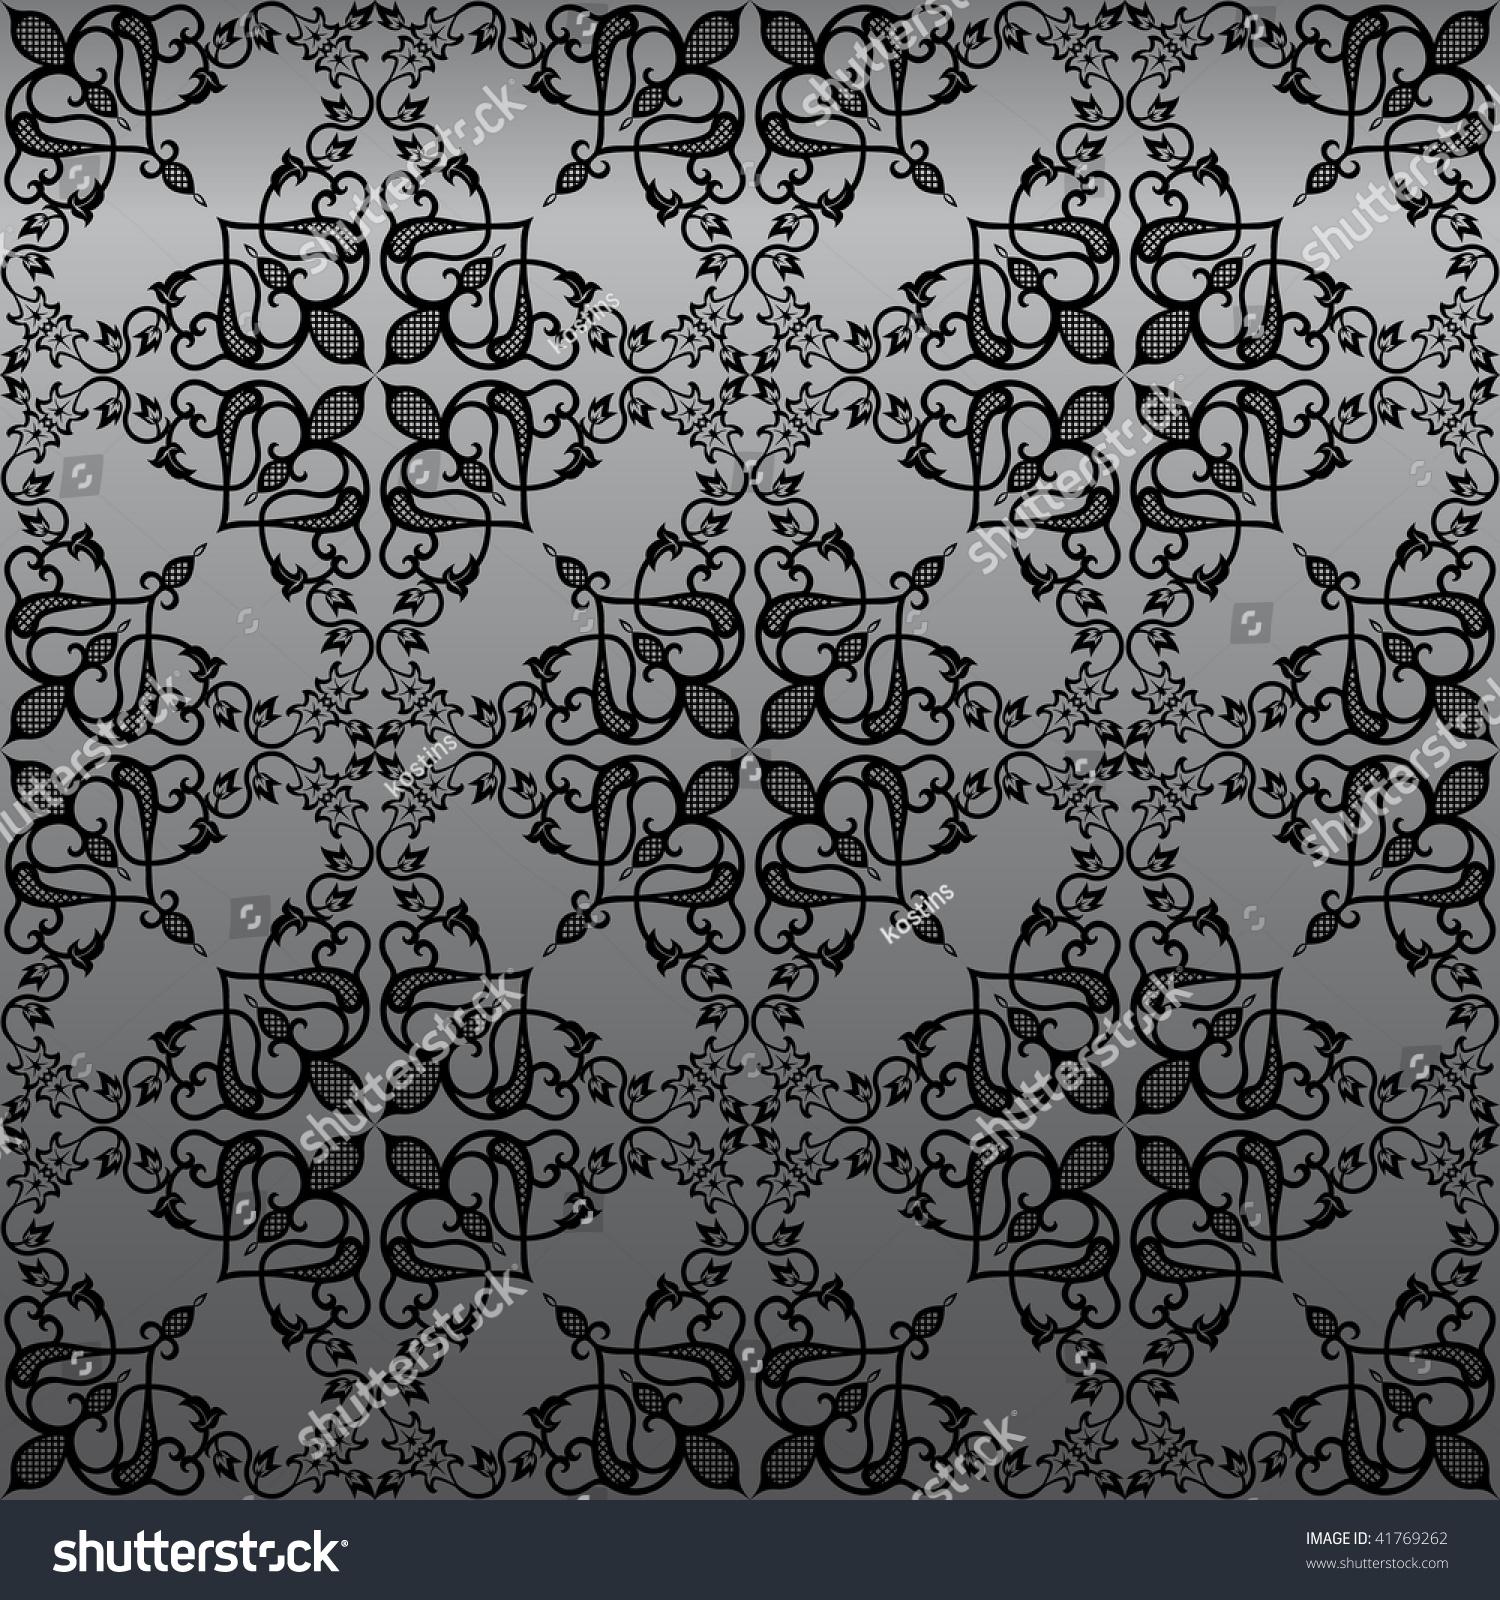 Seamless Gothic Damask Wallpaper Background